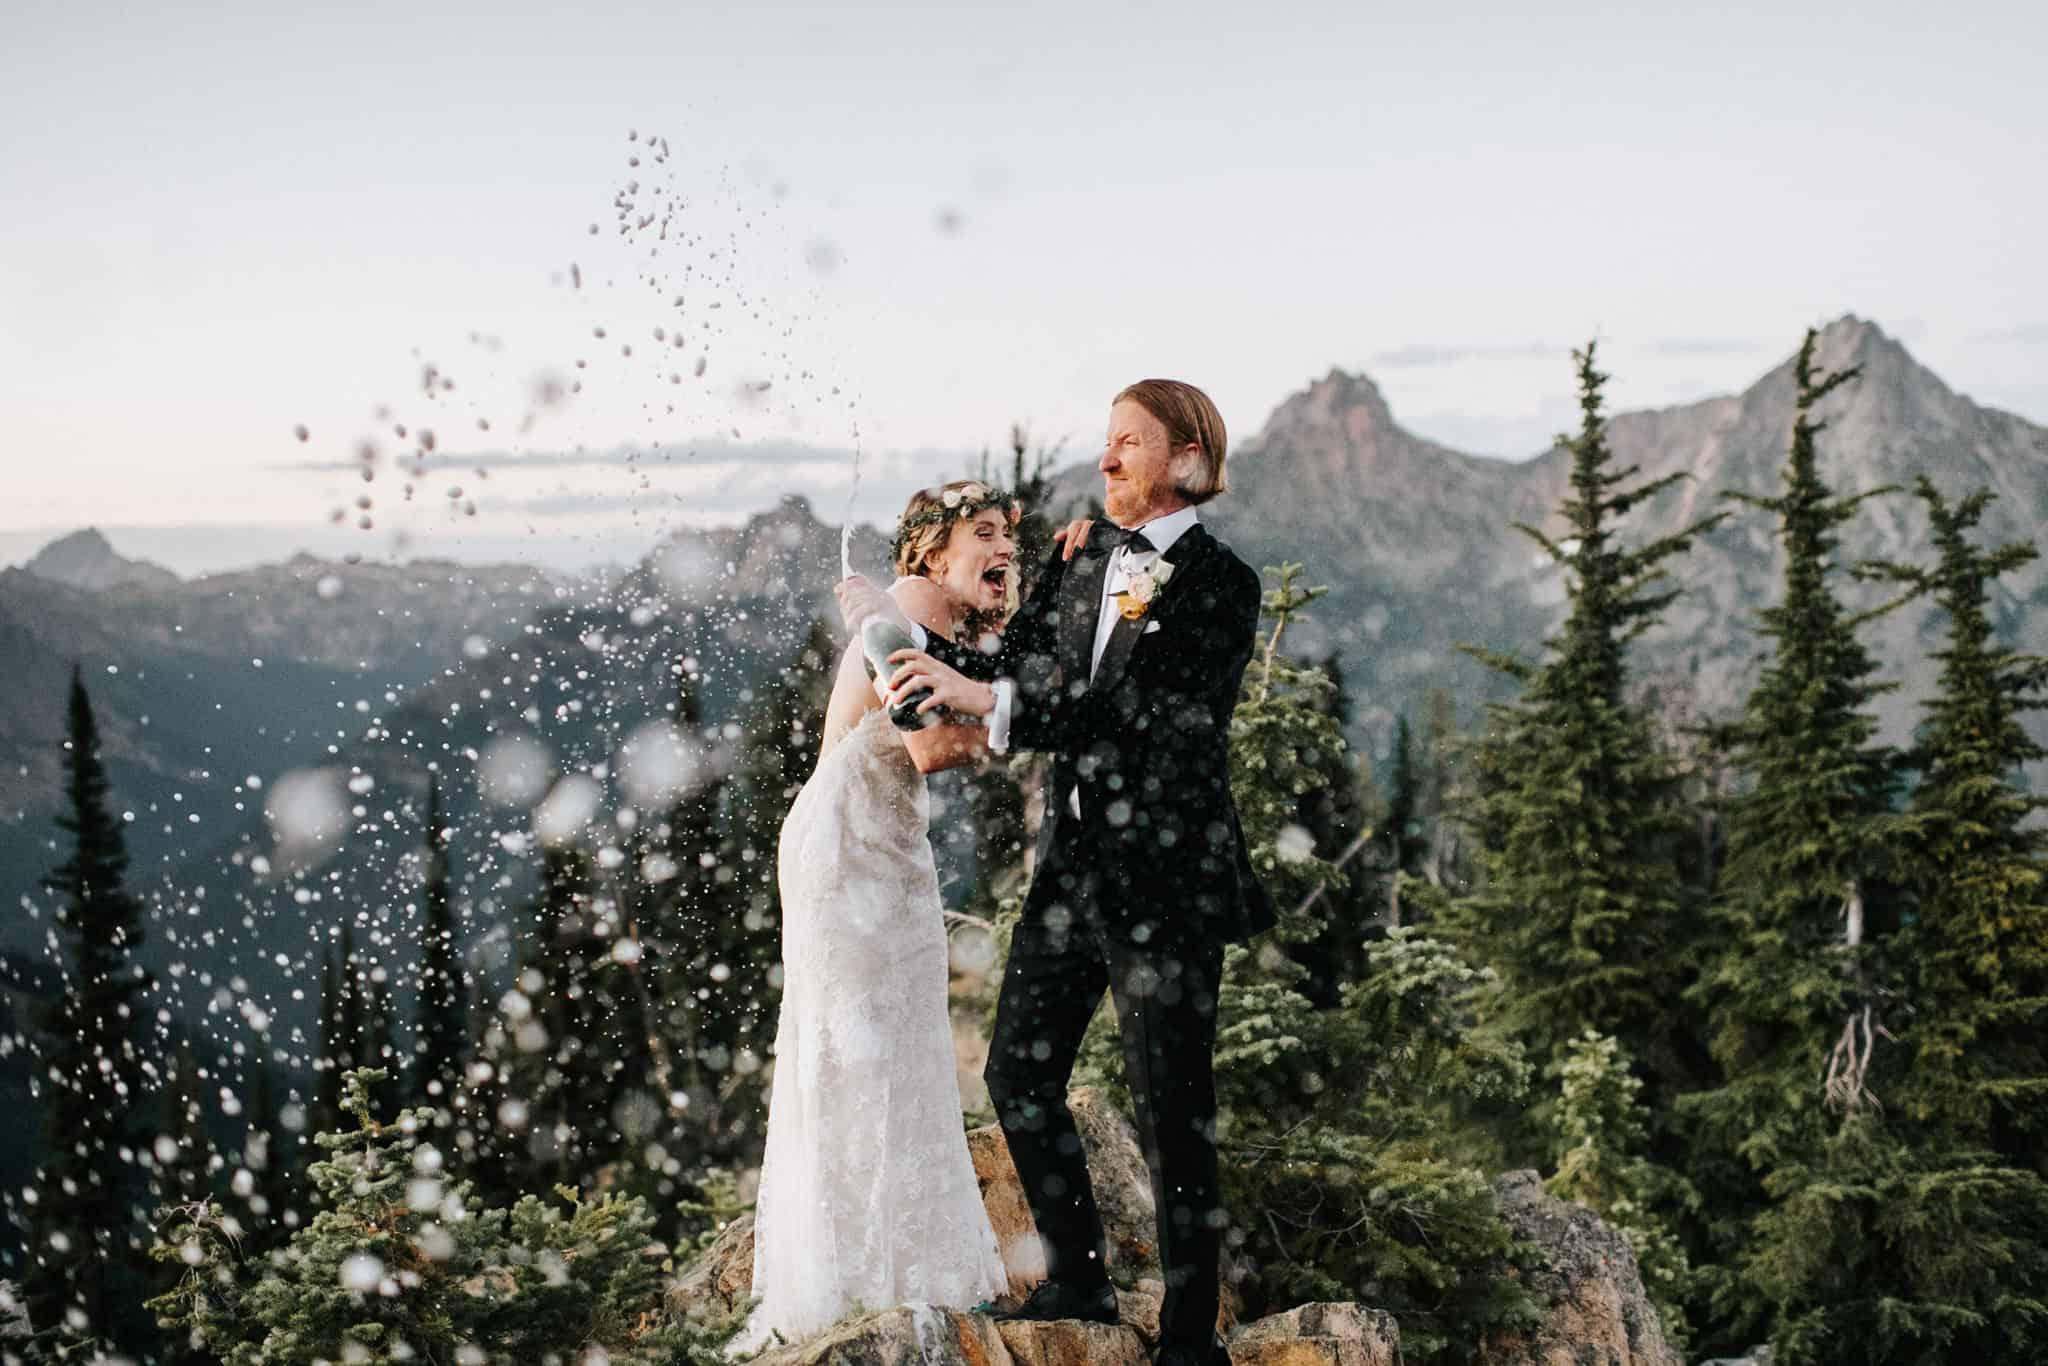 Smoky Mountain National Park Elopement Photographer